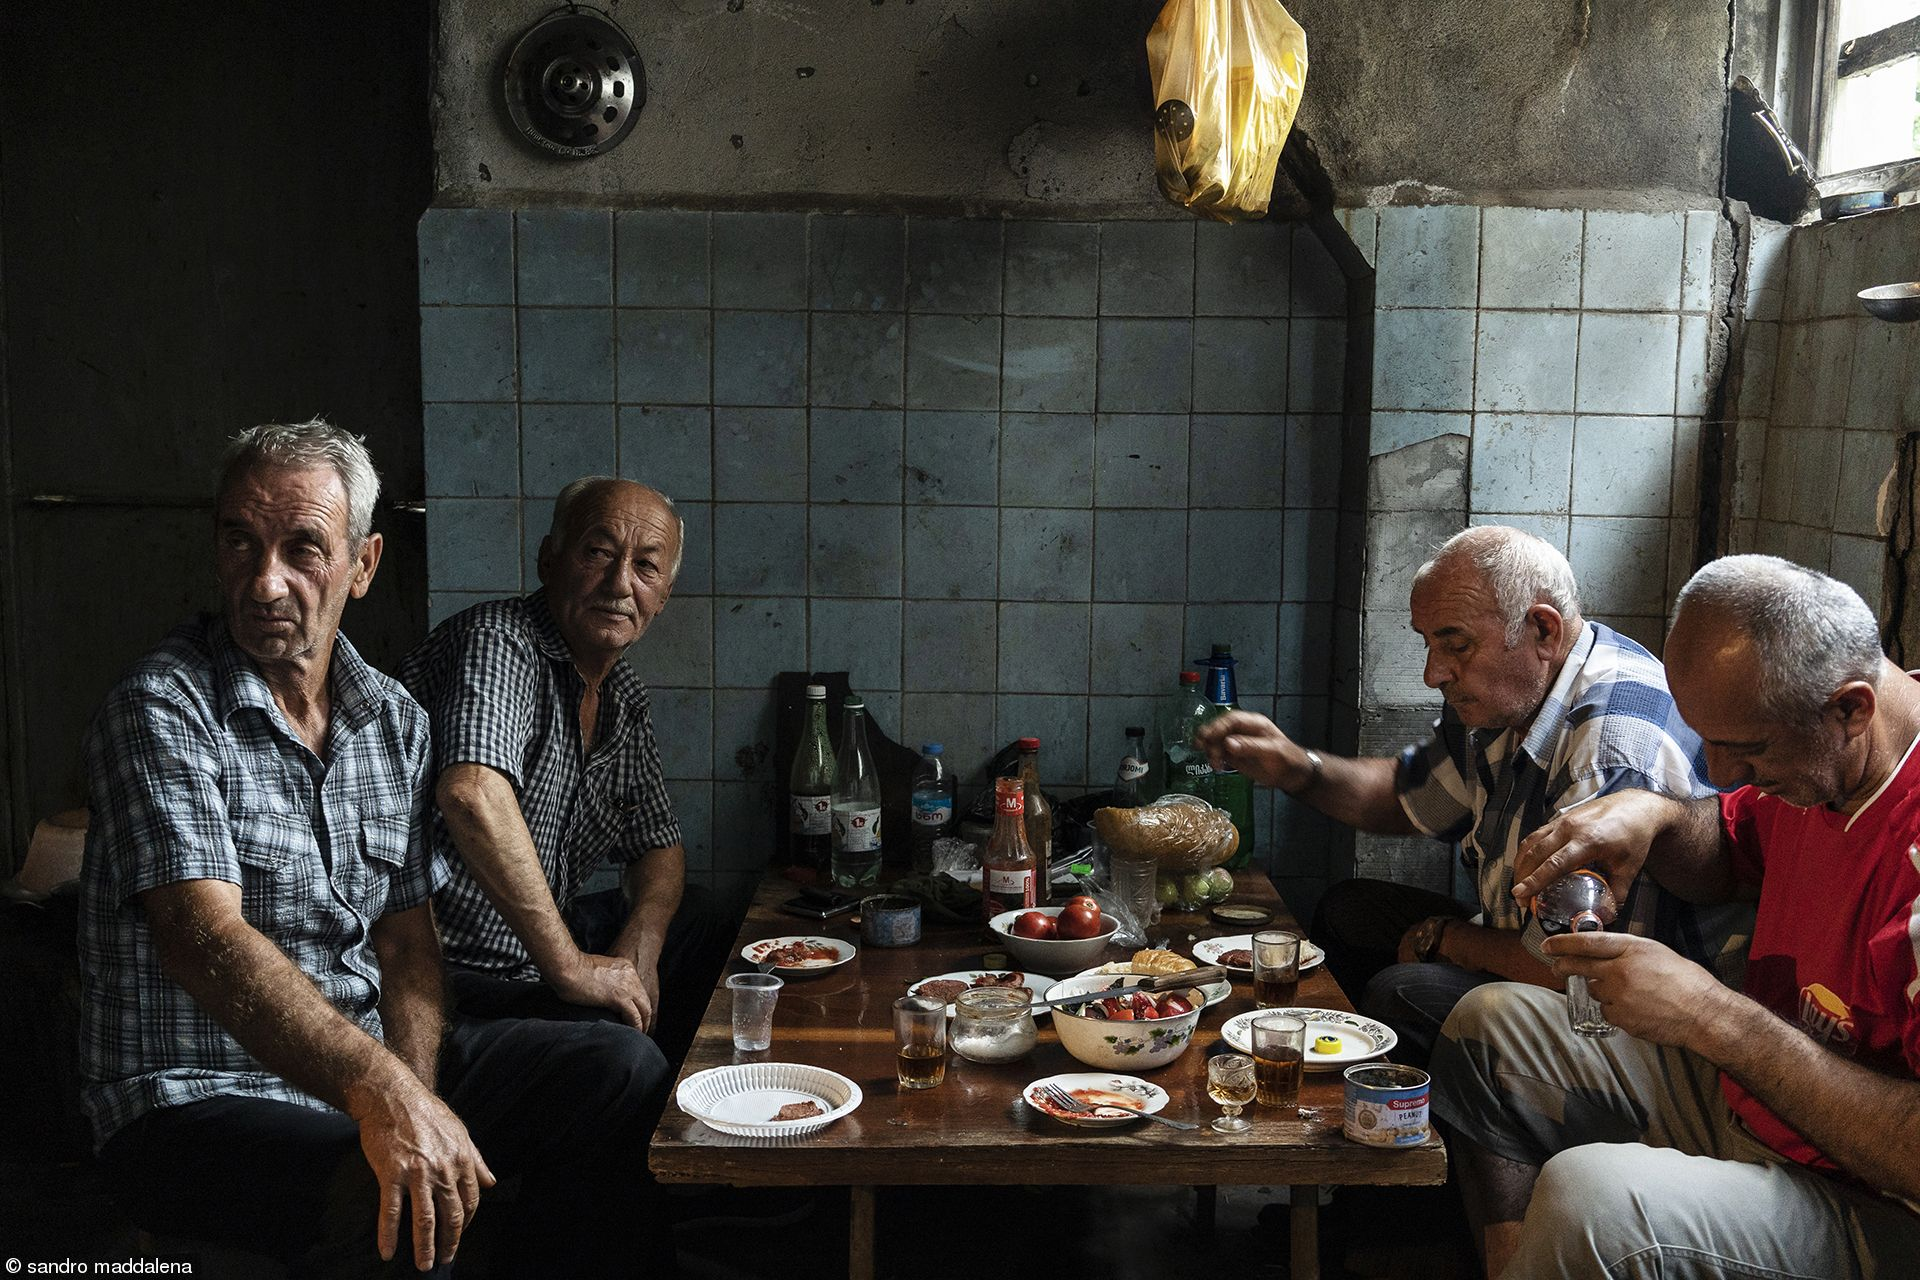 Politics - Sandro Maddalena - Old friends